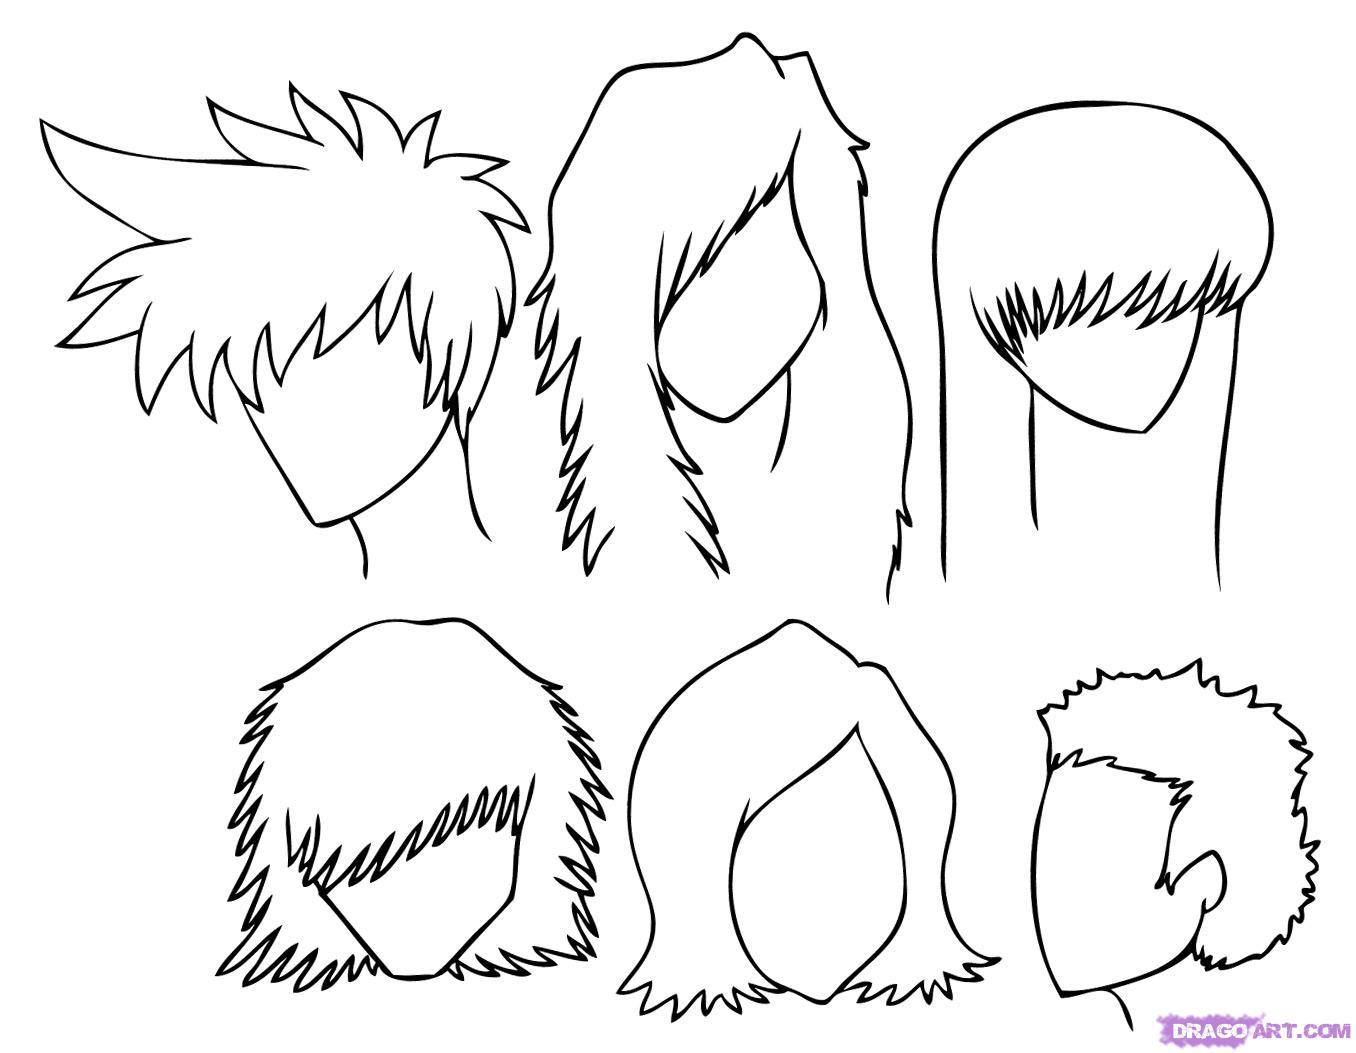 1356x1053 Manga Step By Step Drawing How To Draw Manga Hair, Step By Step